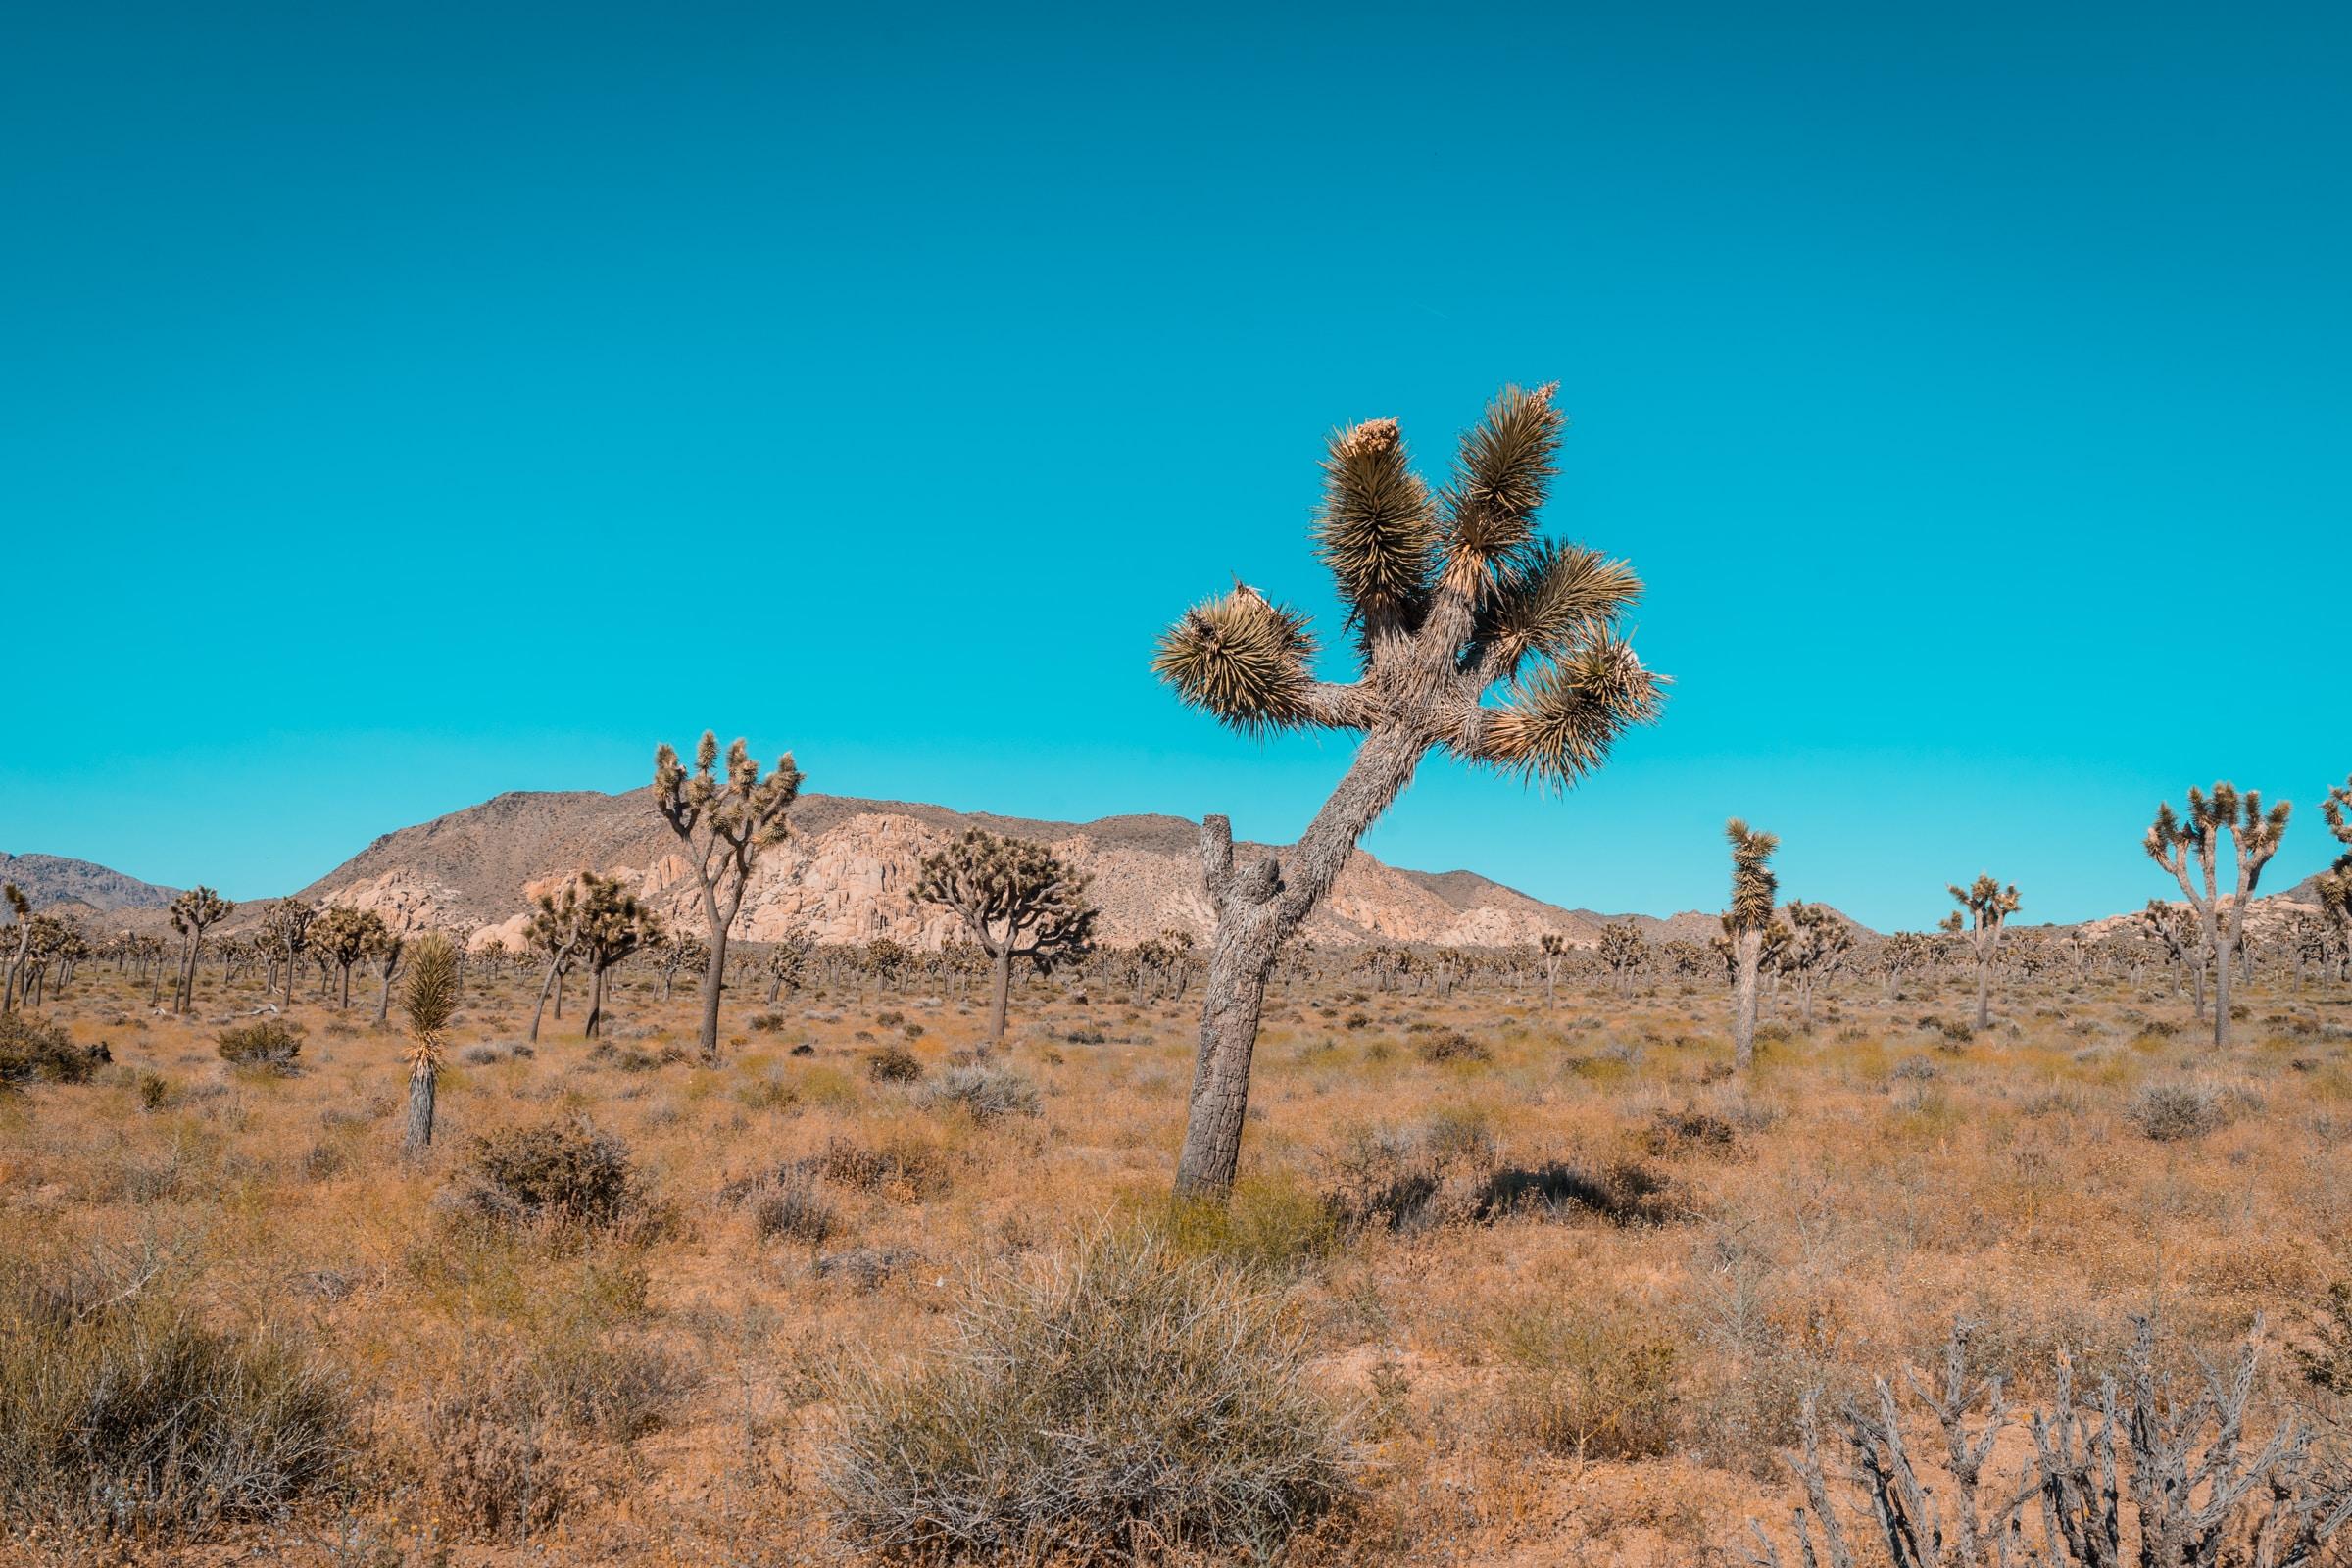 Hot summer day in the desolate desert of Joshua Tree